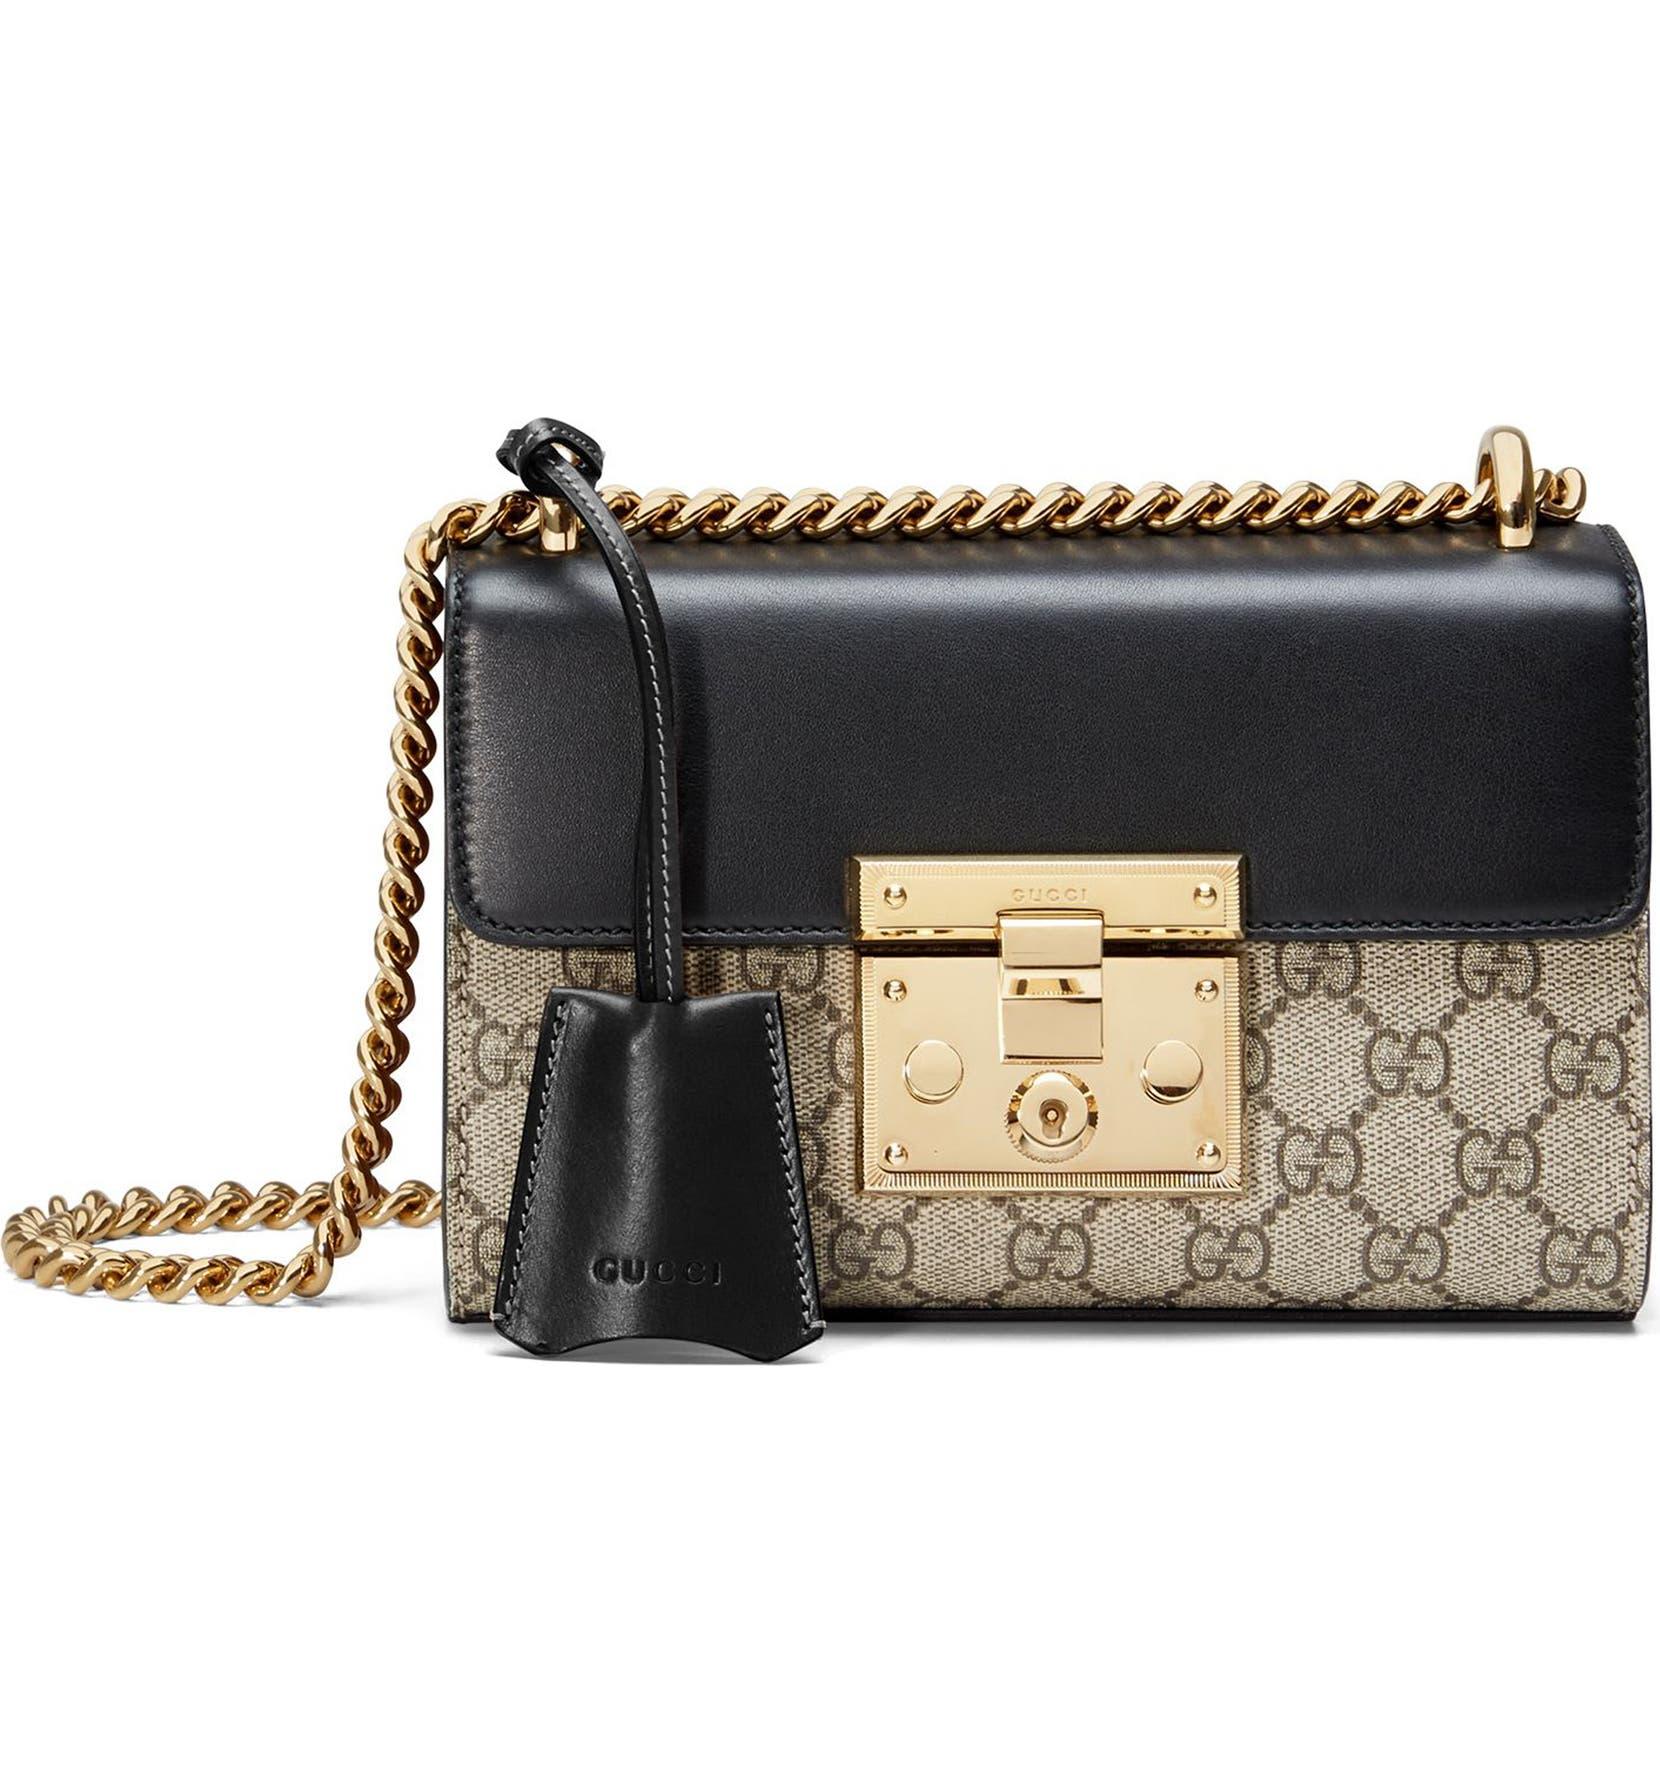 842f5833eadf Gucci Small Padlock GG Supreme Canvas & Leather Shoulder Bag | Nordstrom